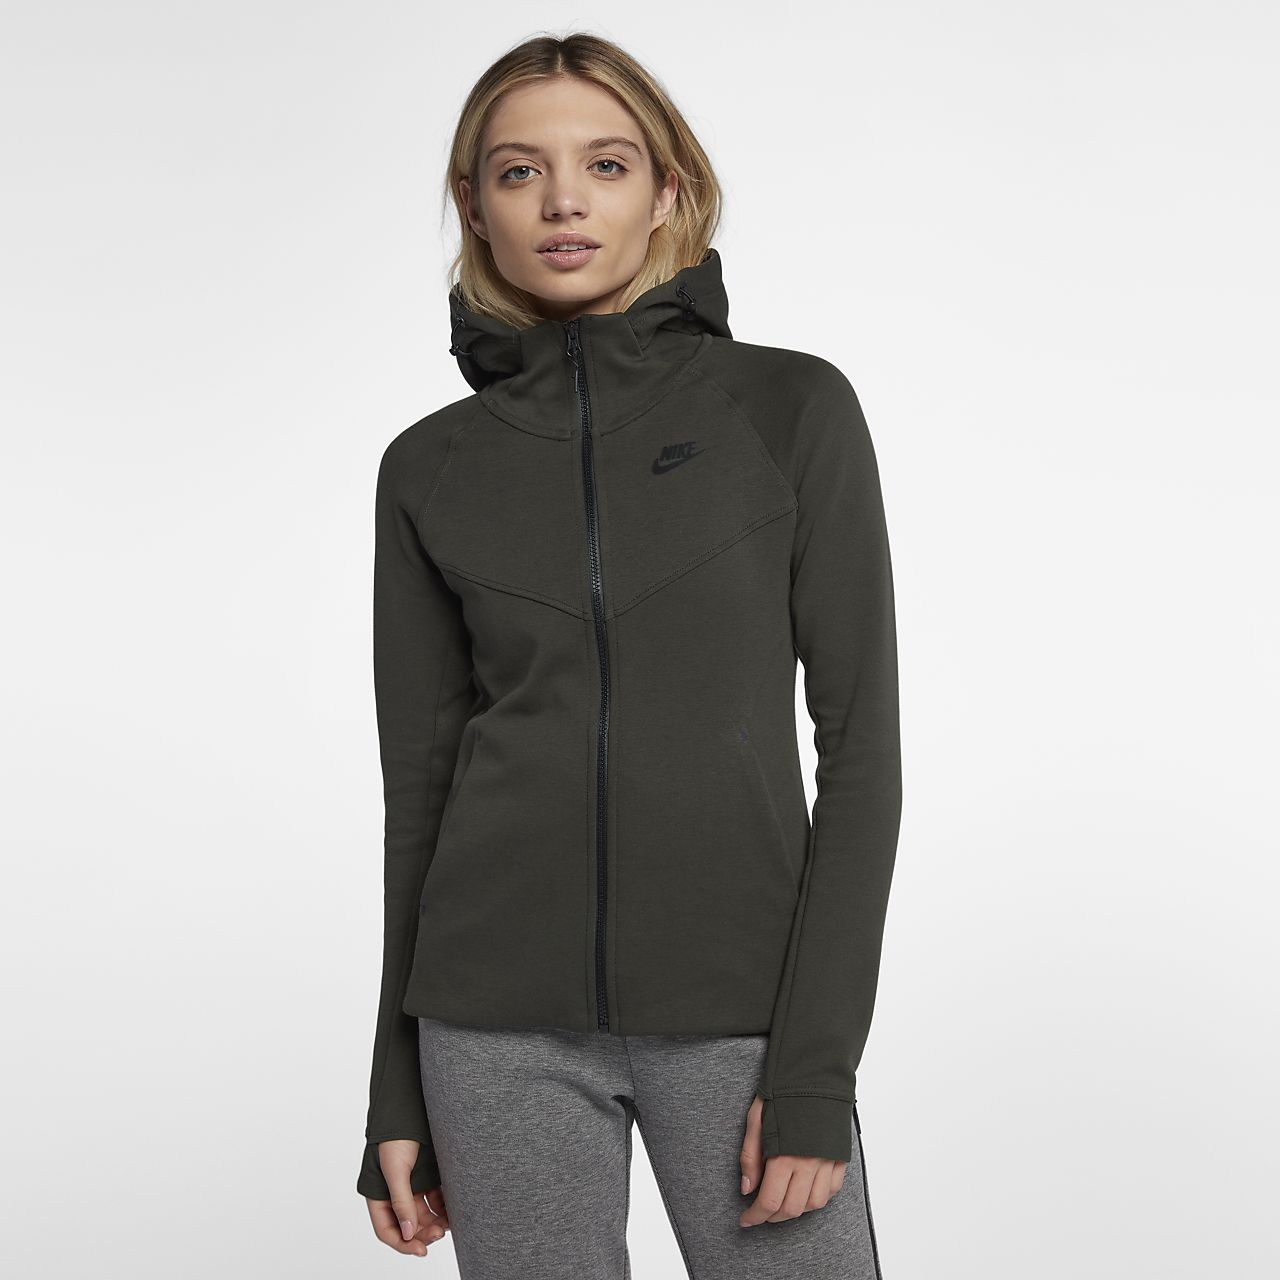 Nike Womens Golf Vest - Nike Tech Black Heather/Black/Black Y66u7998